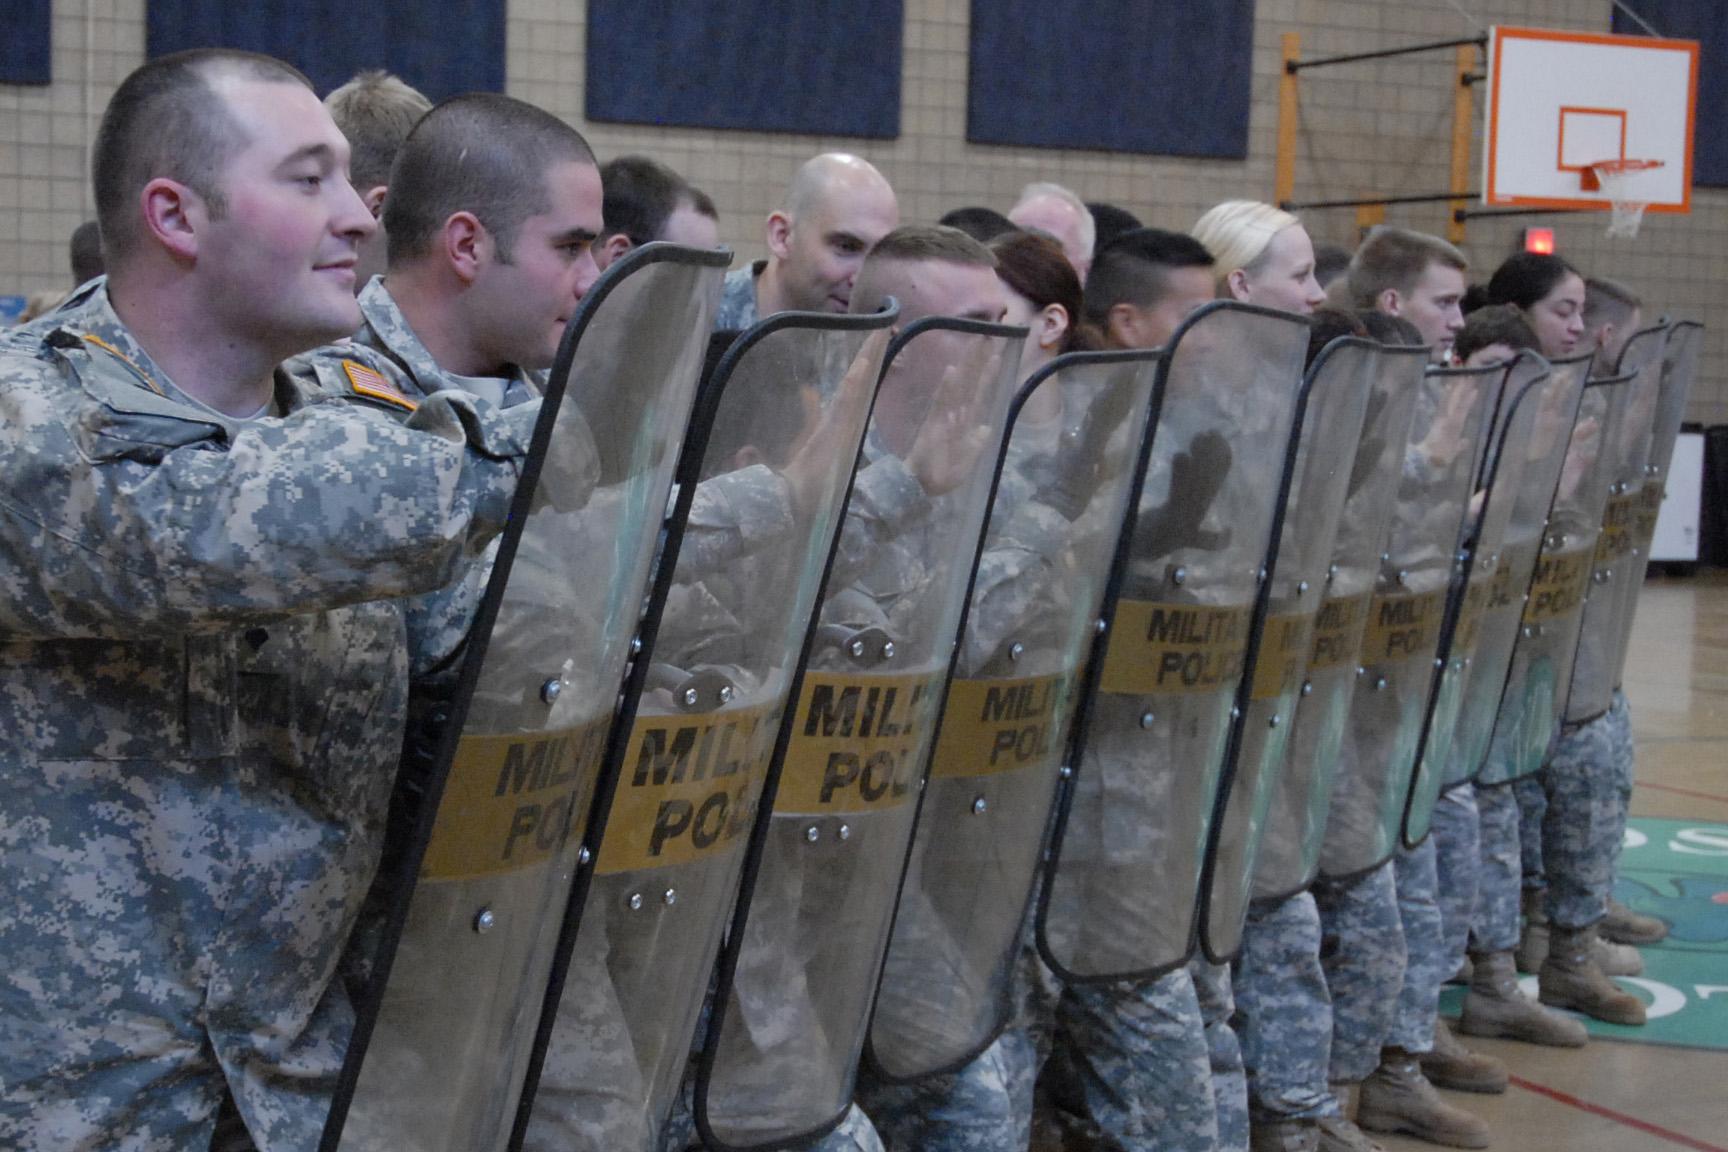 Training_a_riot_squad_-a.jpg